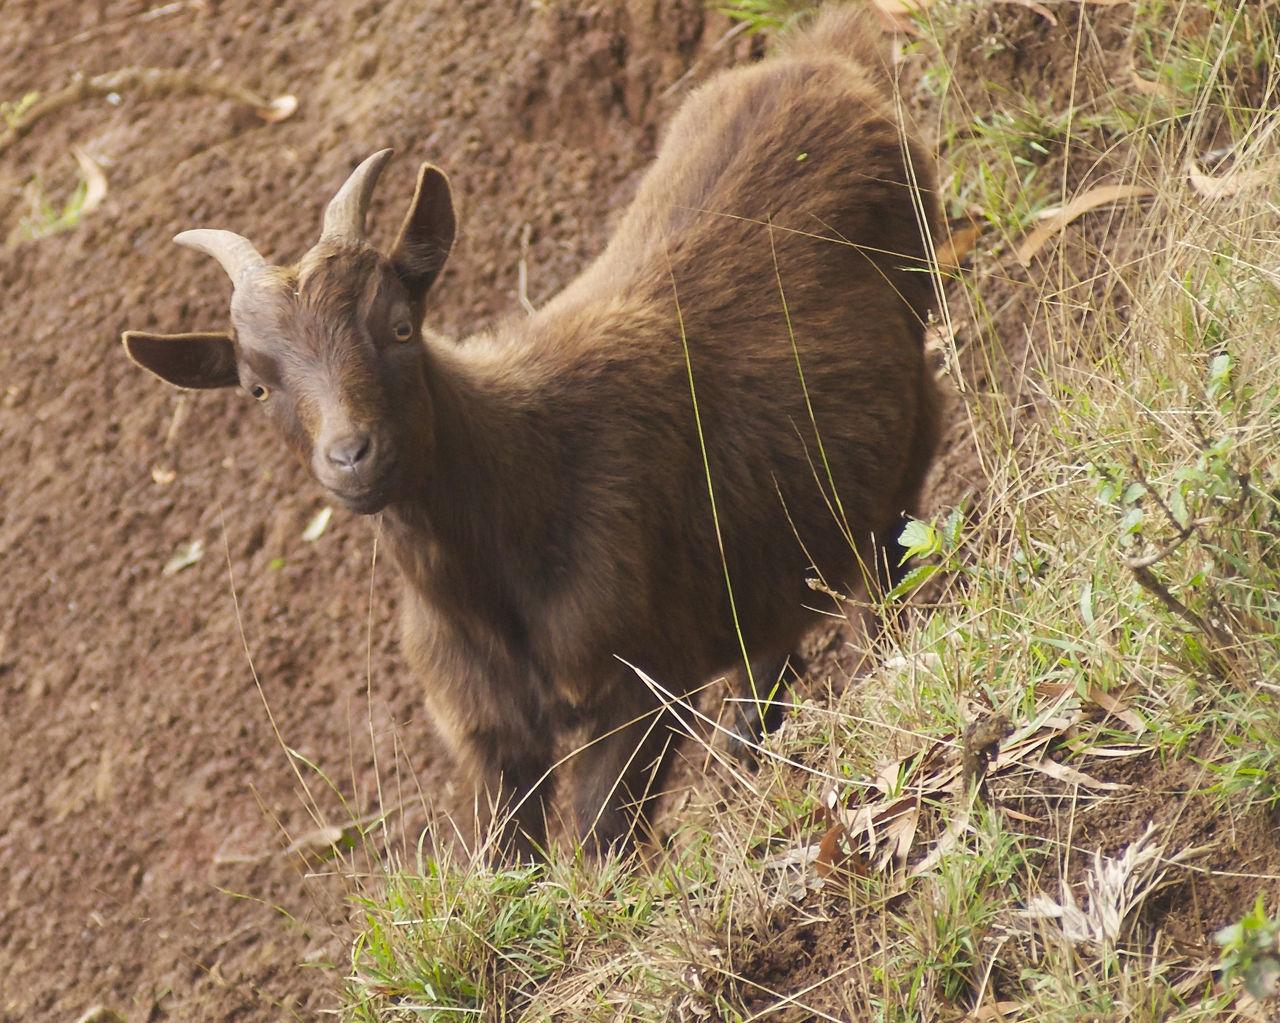 Animal Themes Day Domestic Animals Field Goats Kauai Hawaii Livestock Mammal Nature No People One Animal Outdoors